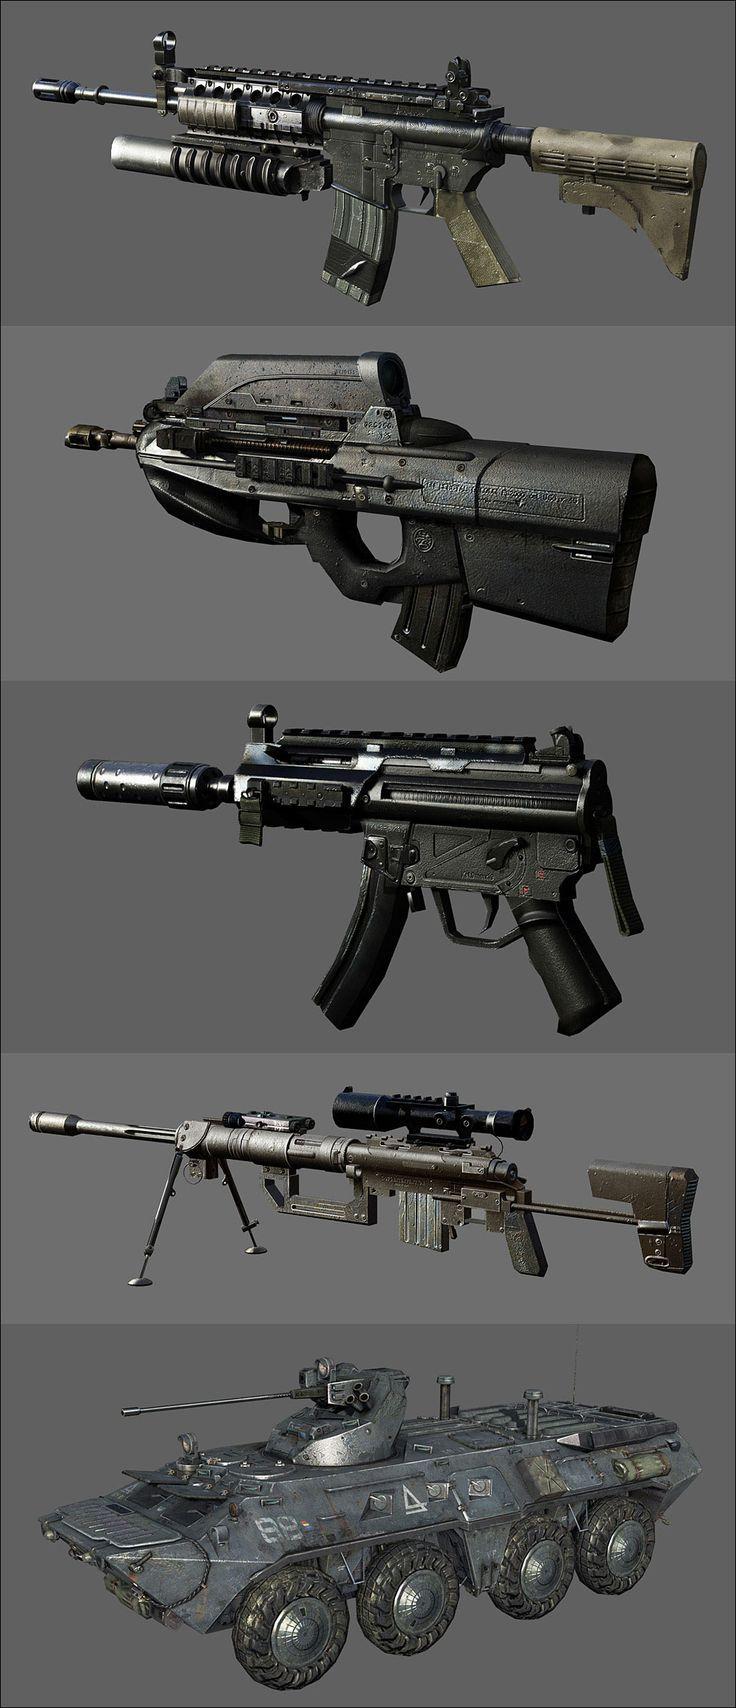 Cf72a19483da169f9076b08b62b3b2b0 Jpg 736 1708 Call Of Duty